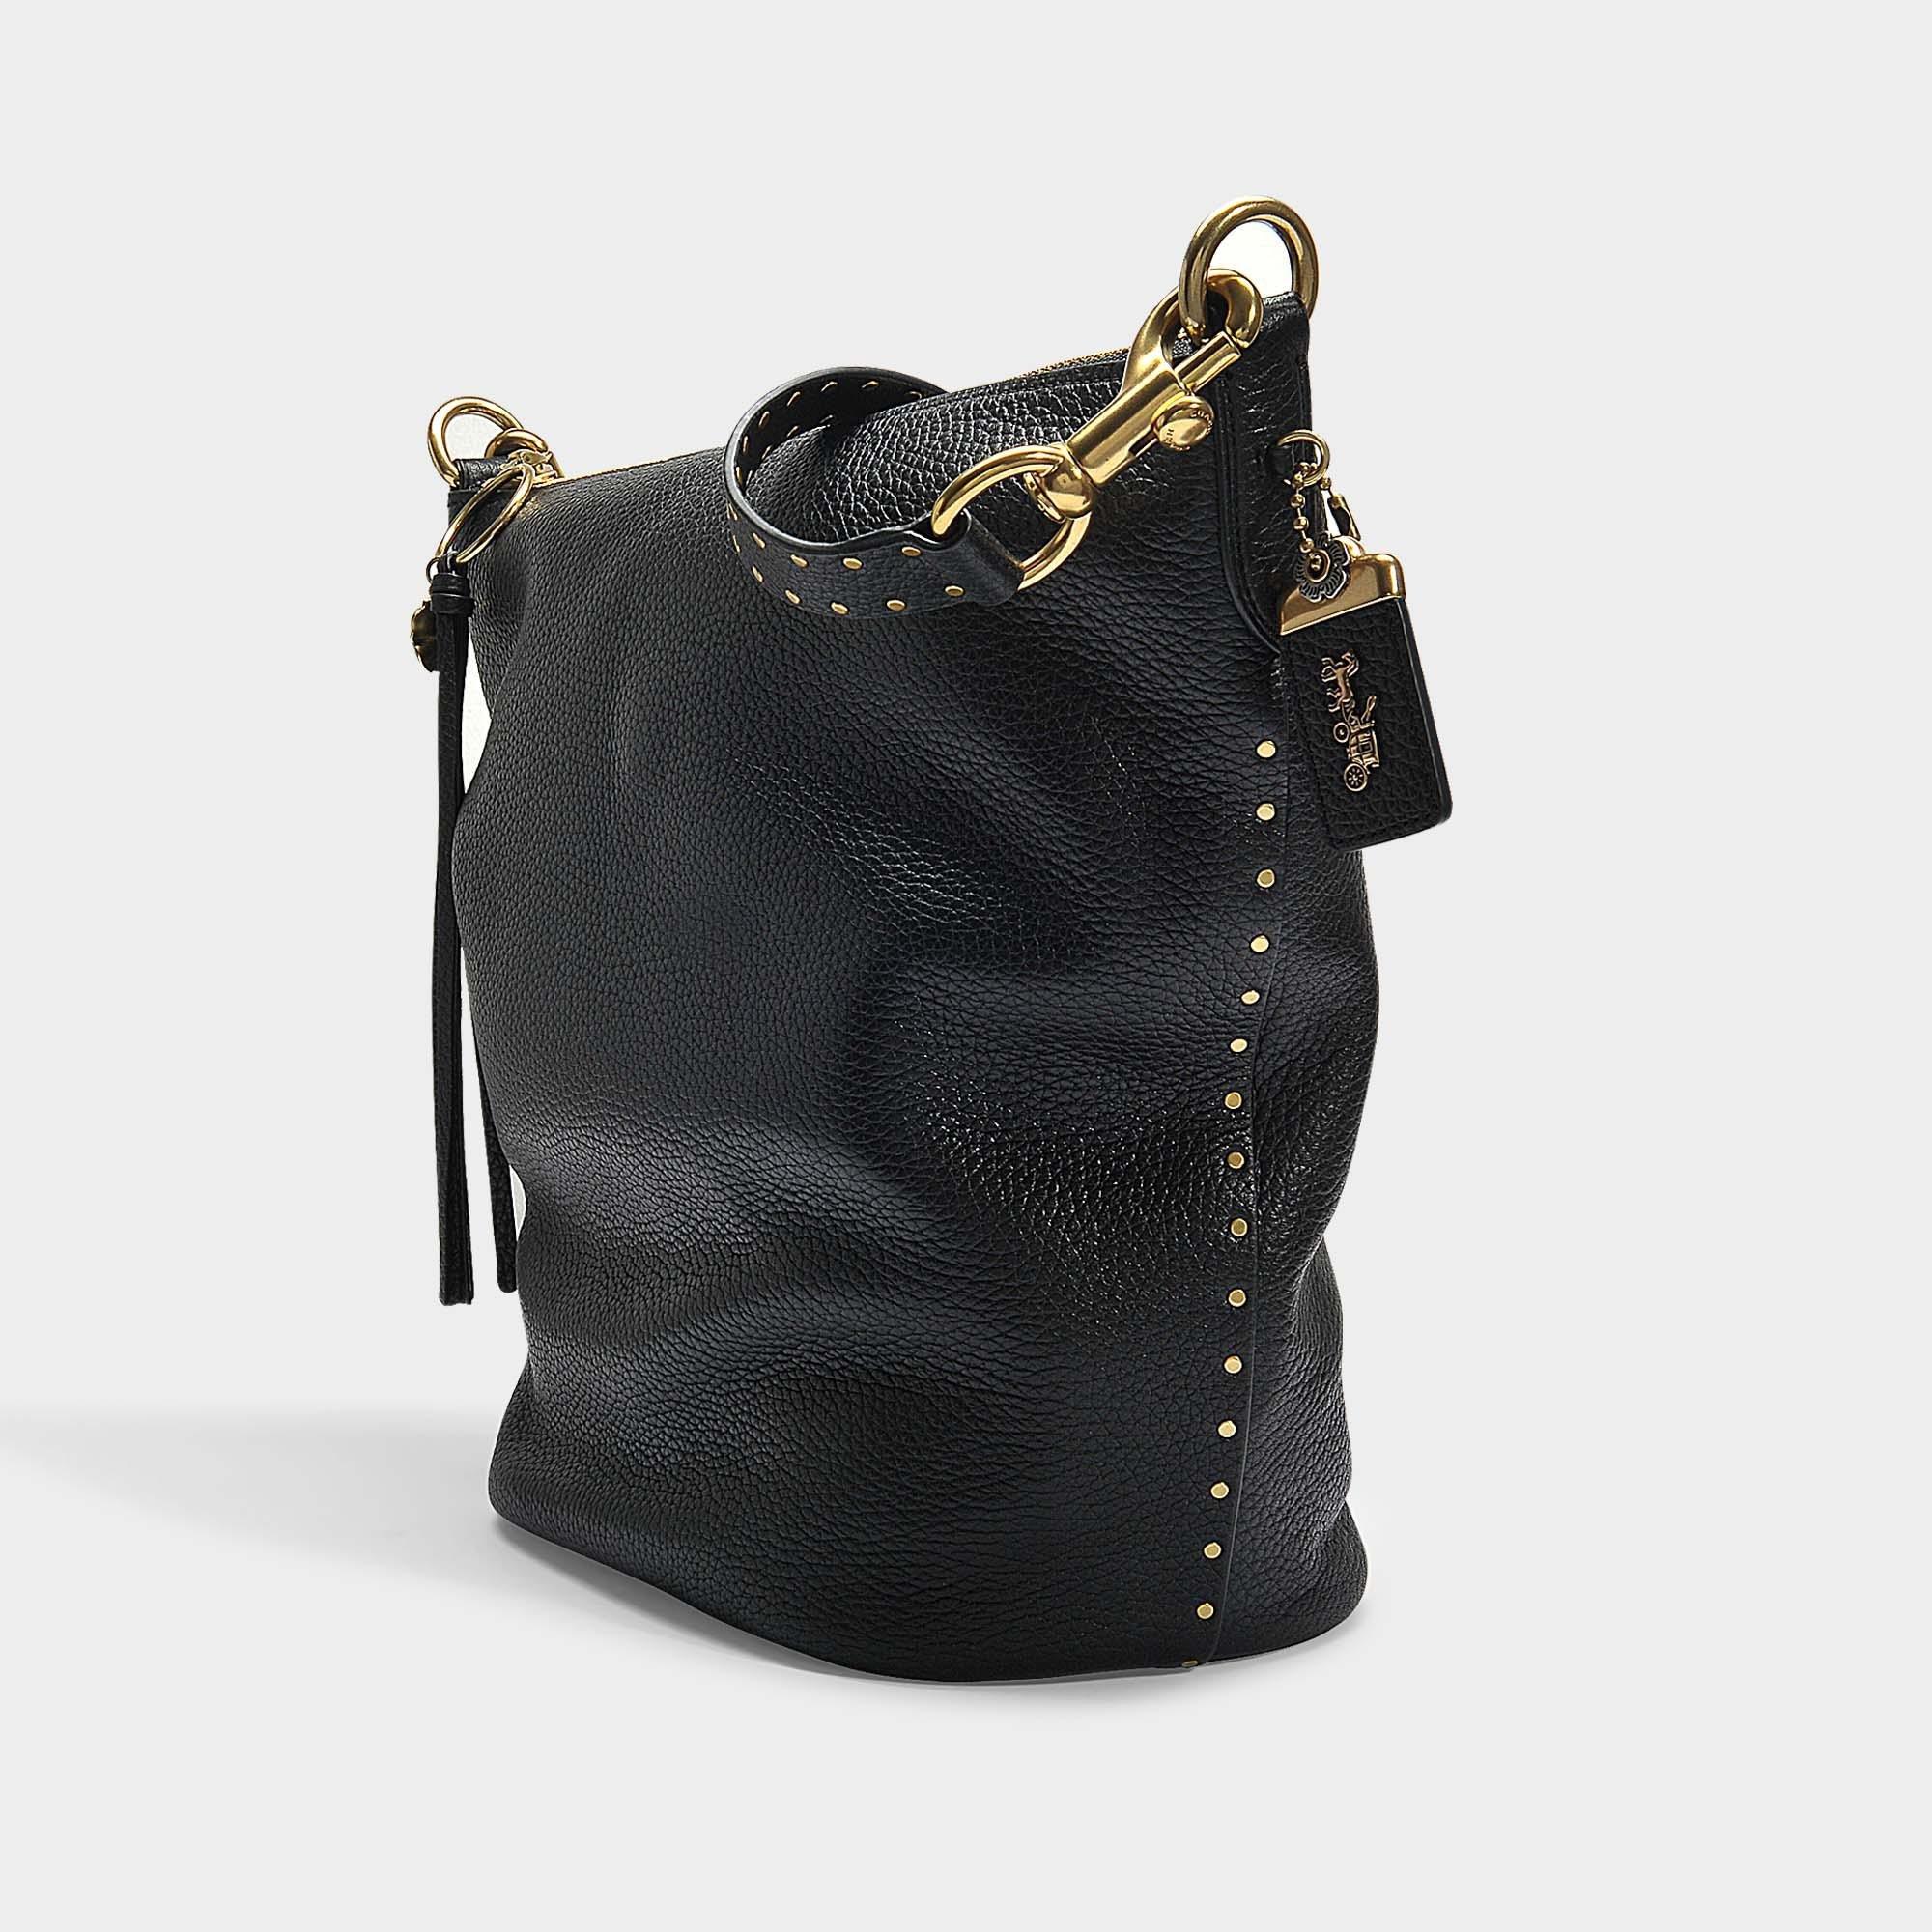 138fb36675007 Lyst - COACH Border Rivets Duffle Bag In Black Calfskin in Black